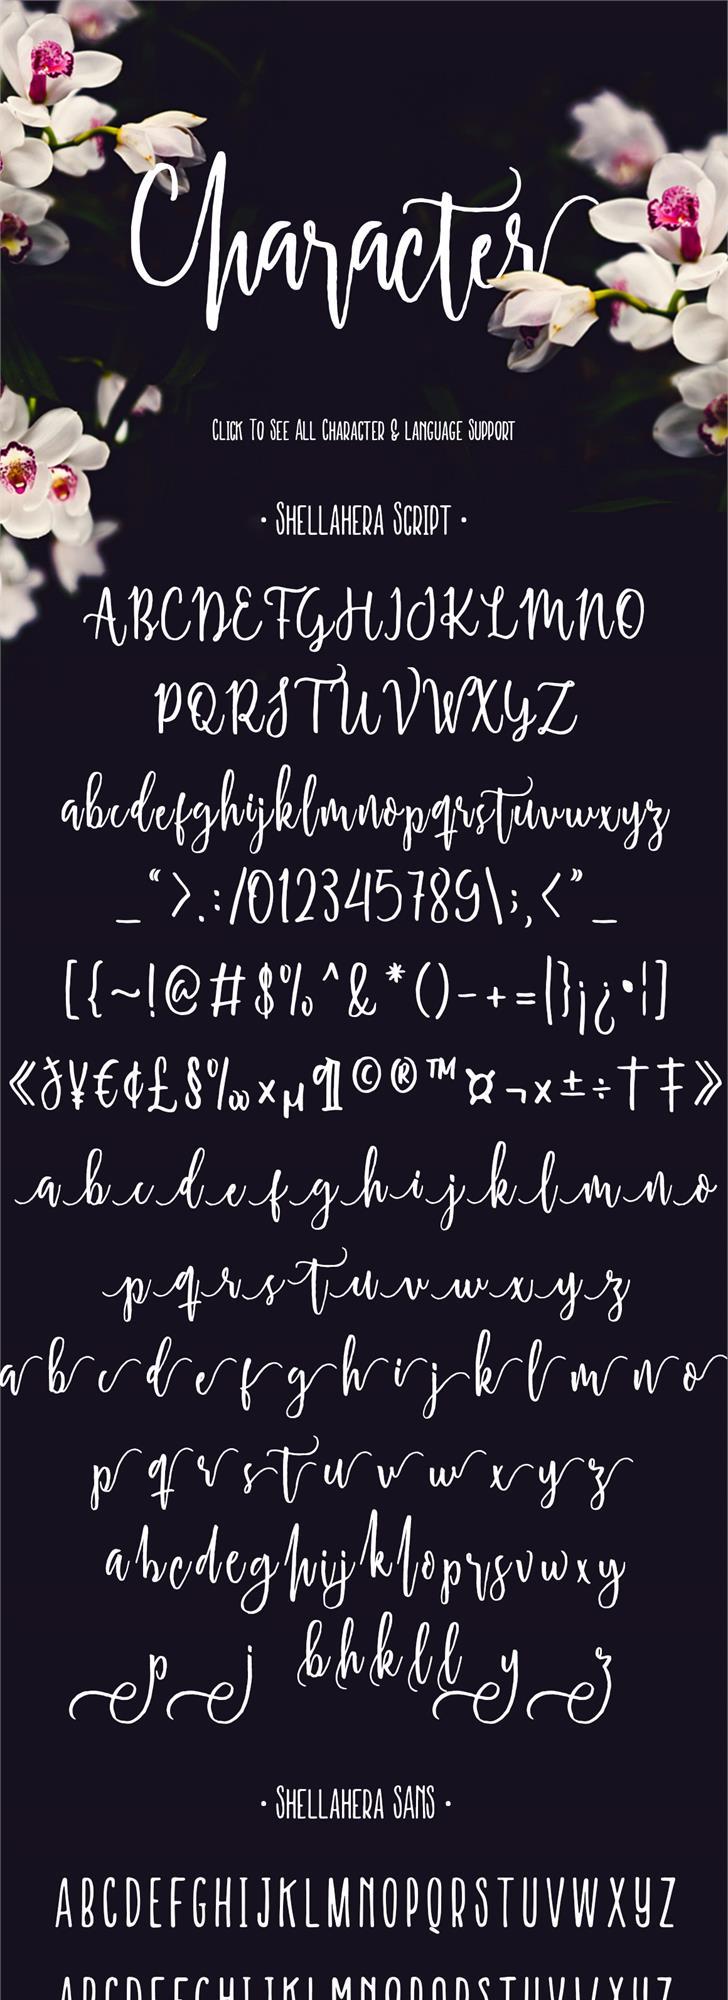 Shellahera Script Demo font by Lostvoltype Foundry